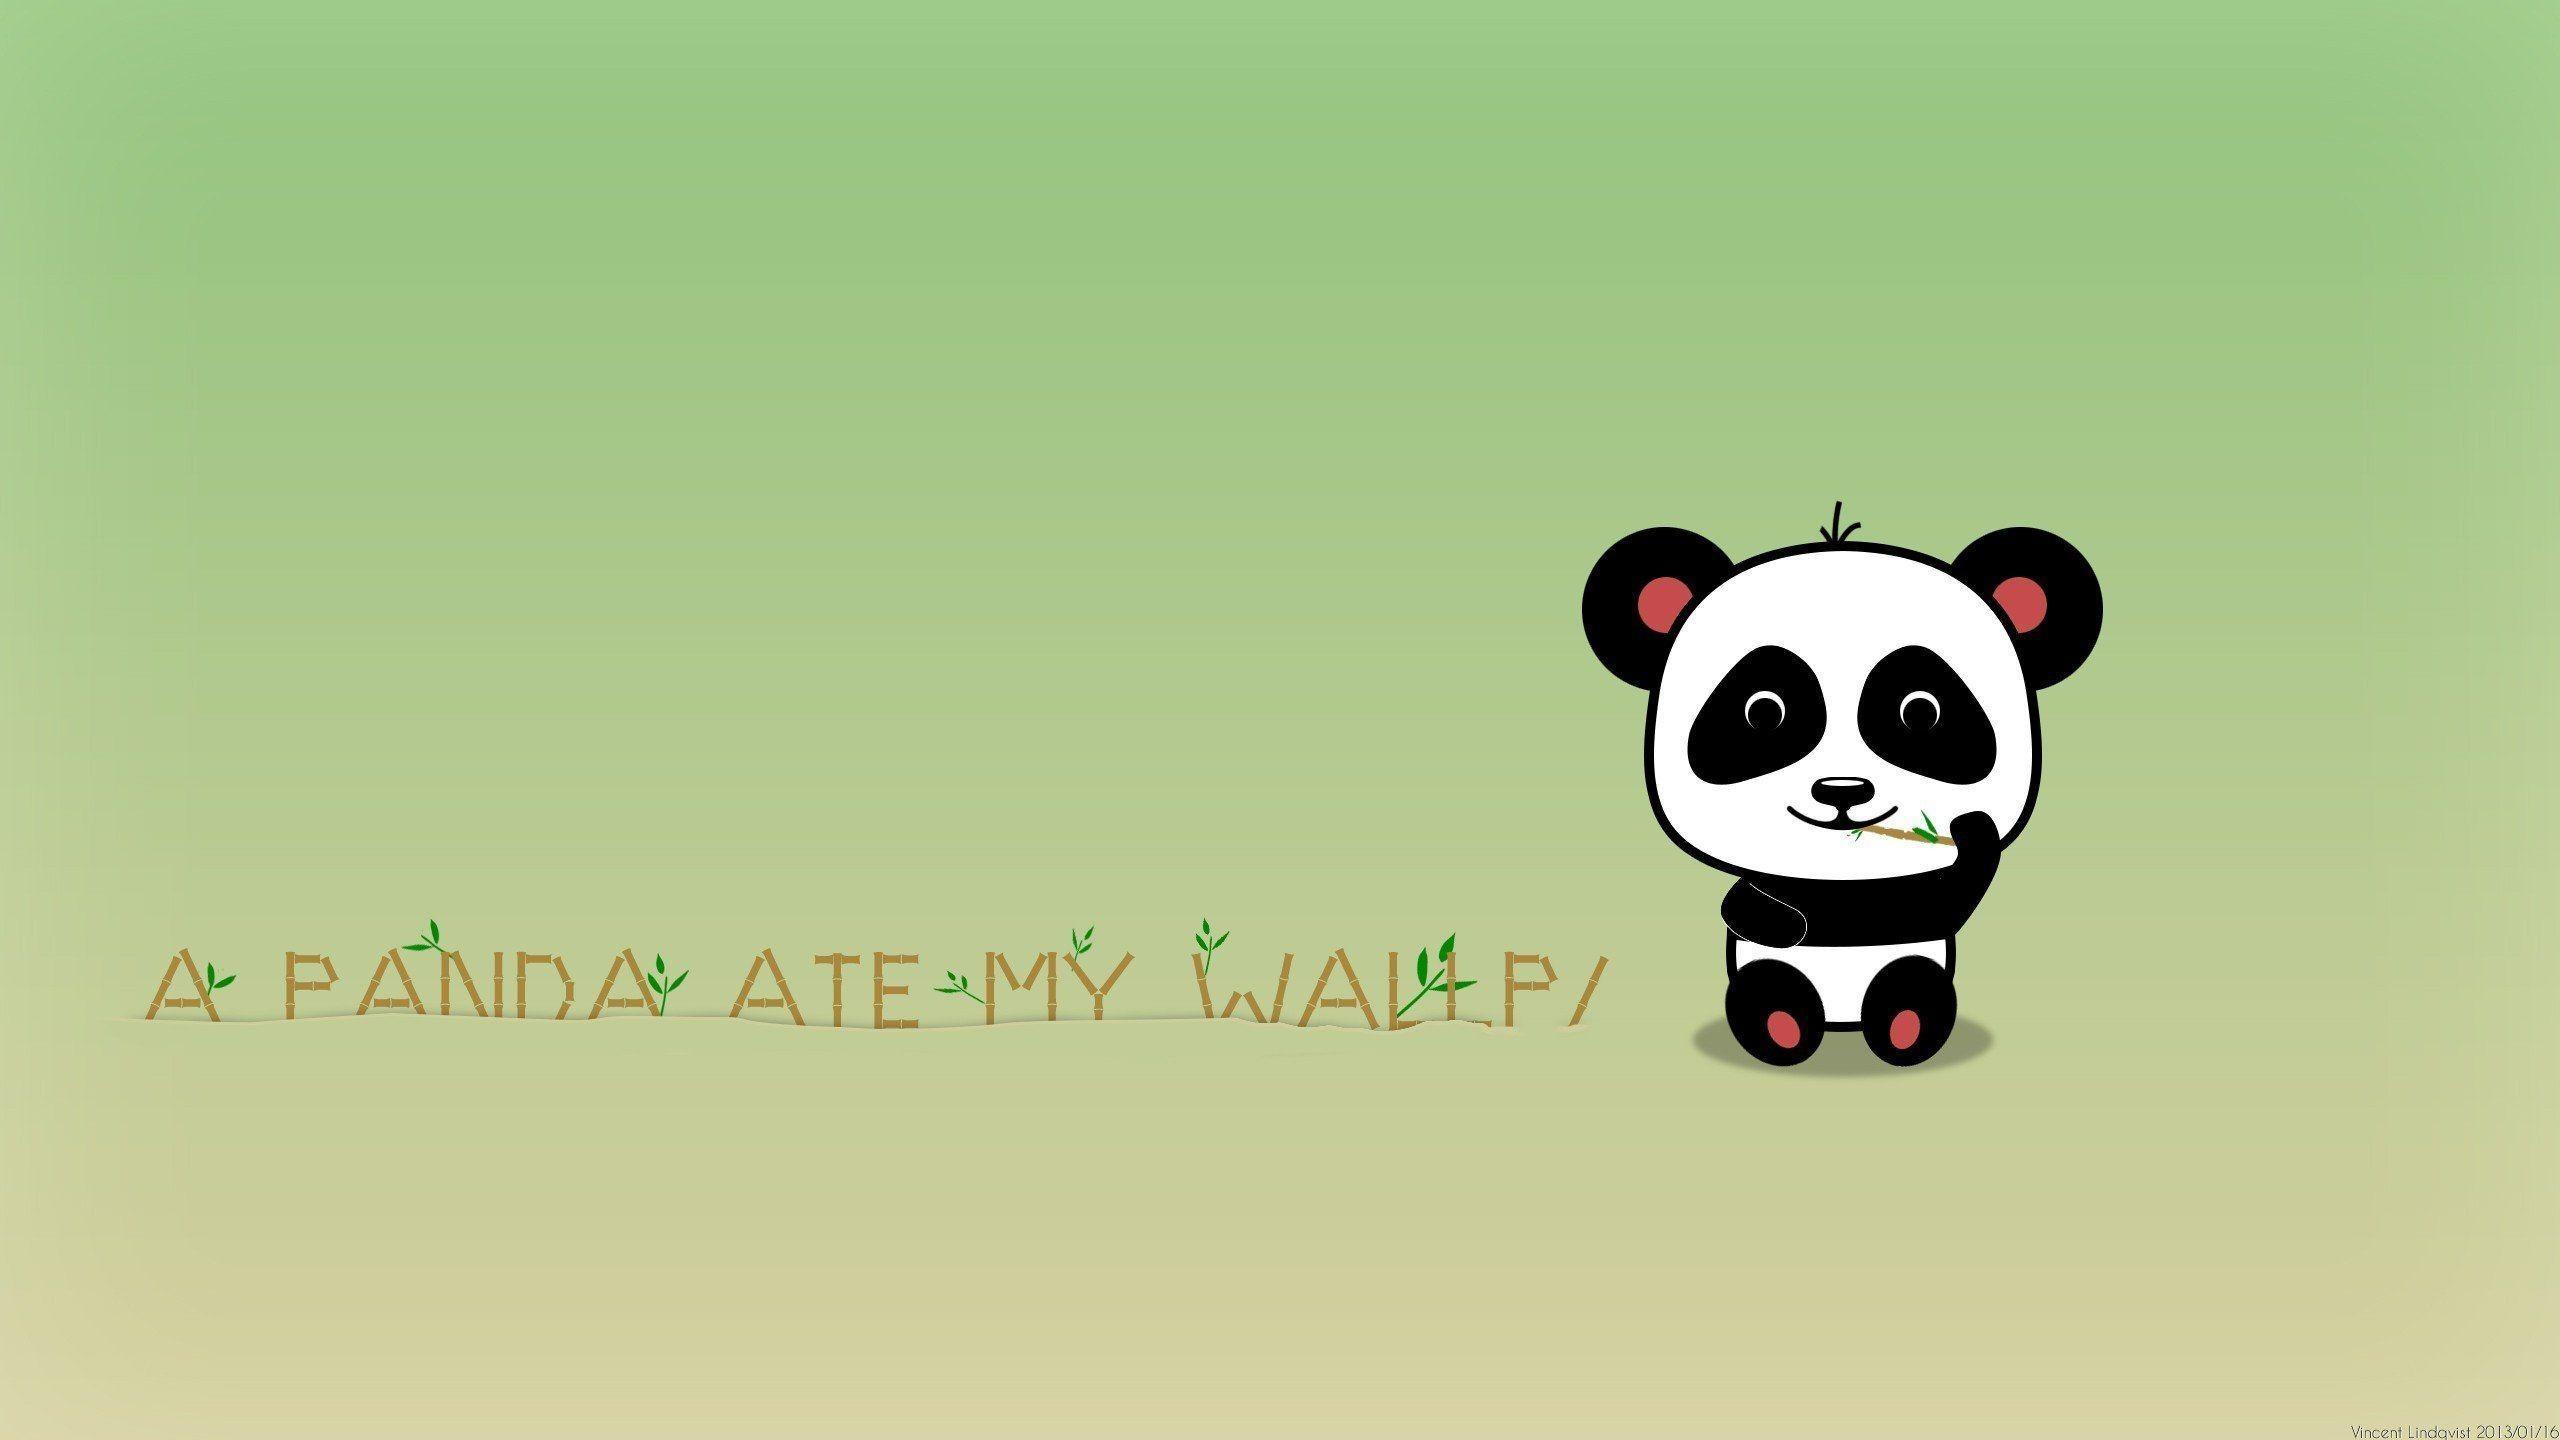 Res: 2560x1440,  Wallpapers For > Cute Cartoon Panda Wallpaper